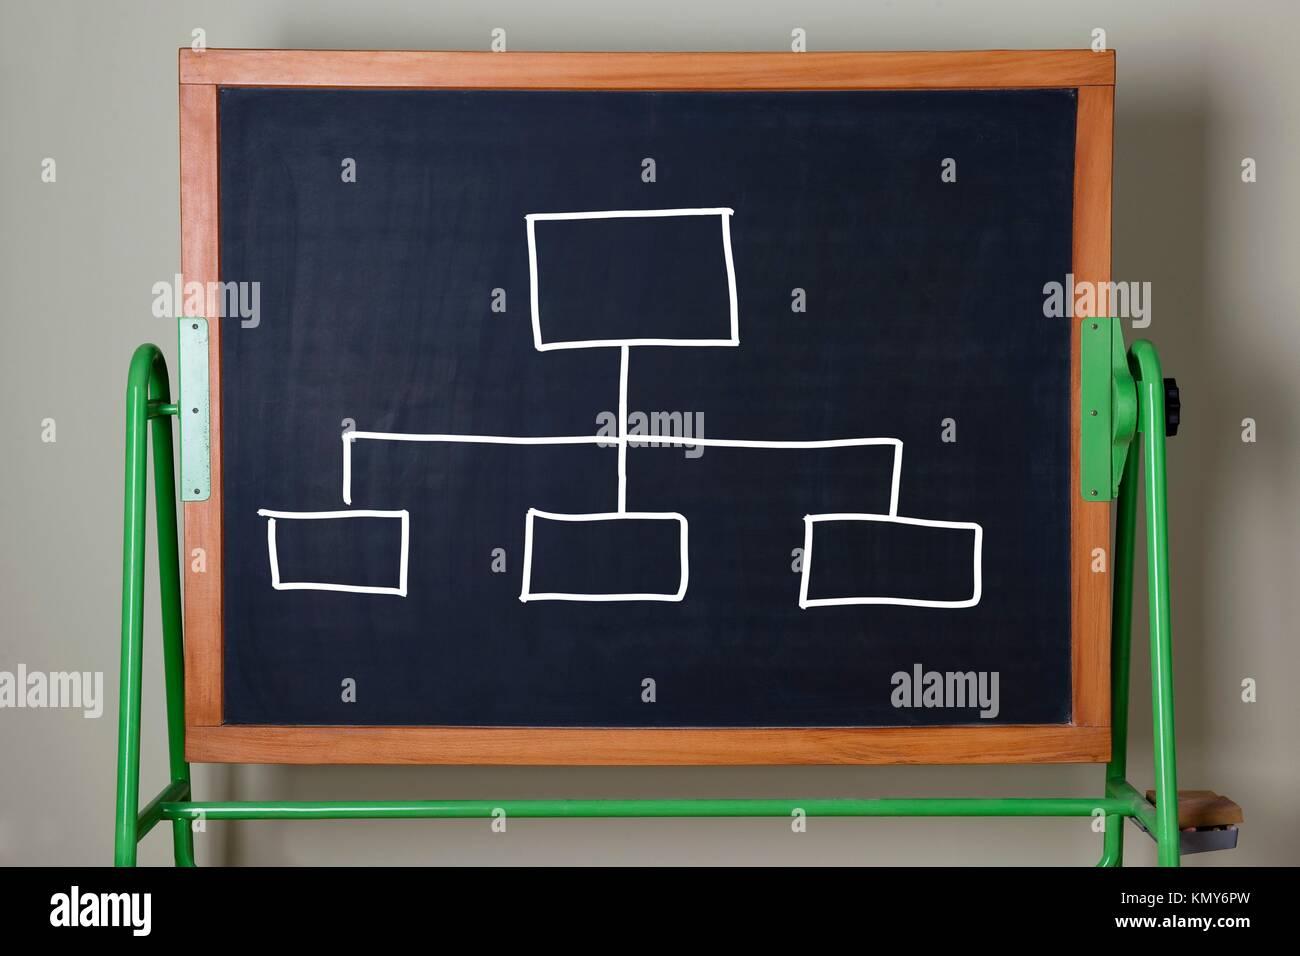 Blackboard with empty diagram - Stock Image